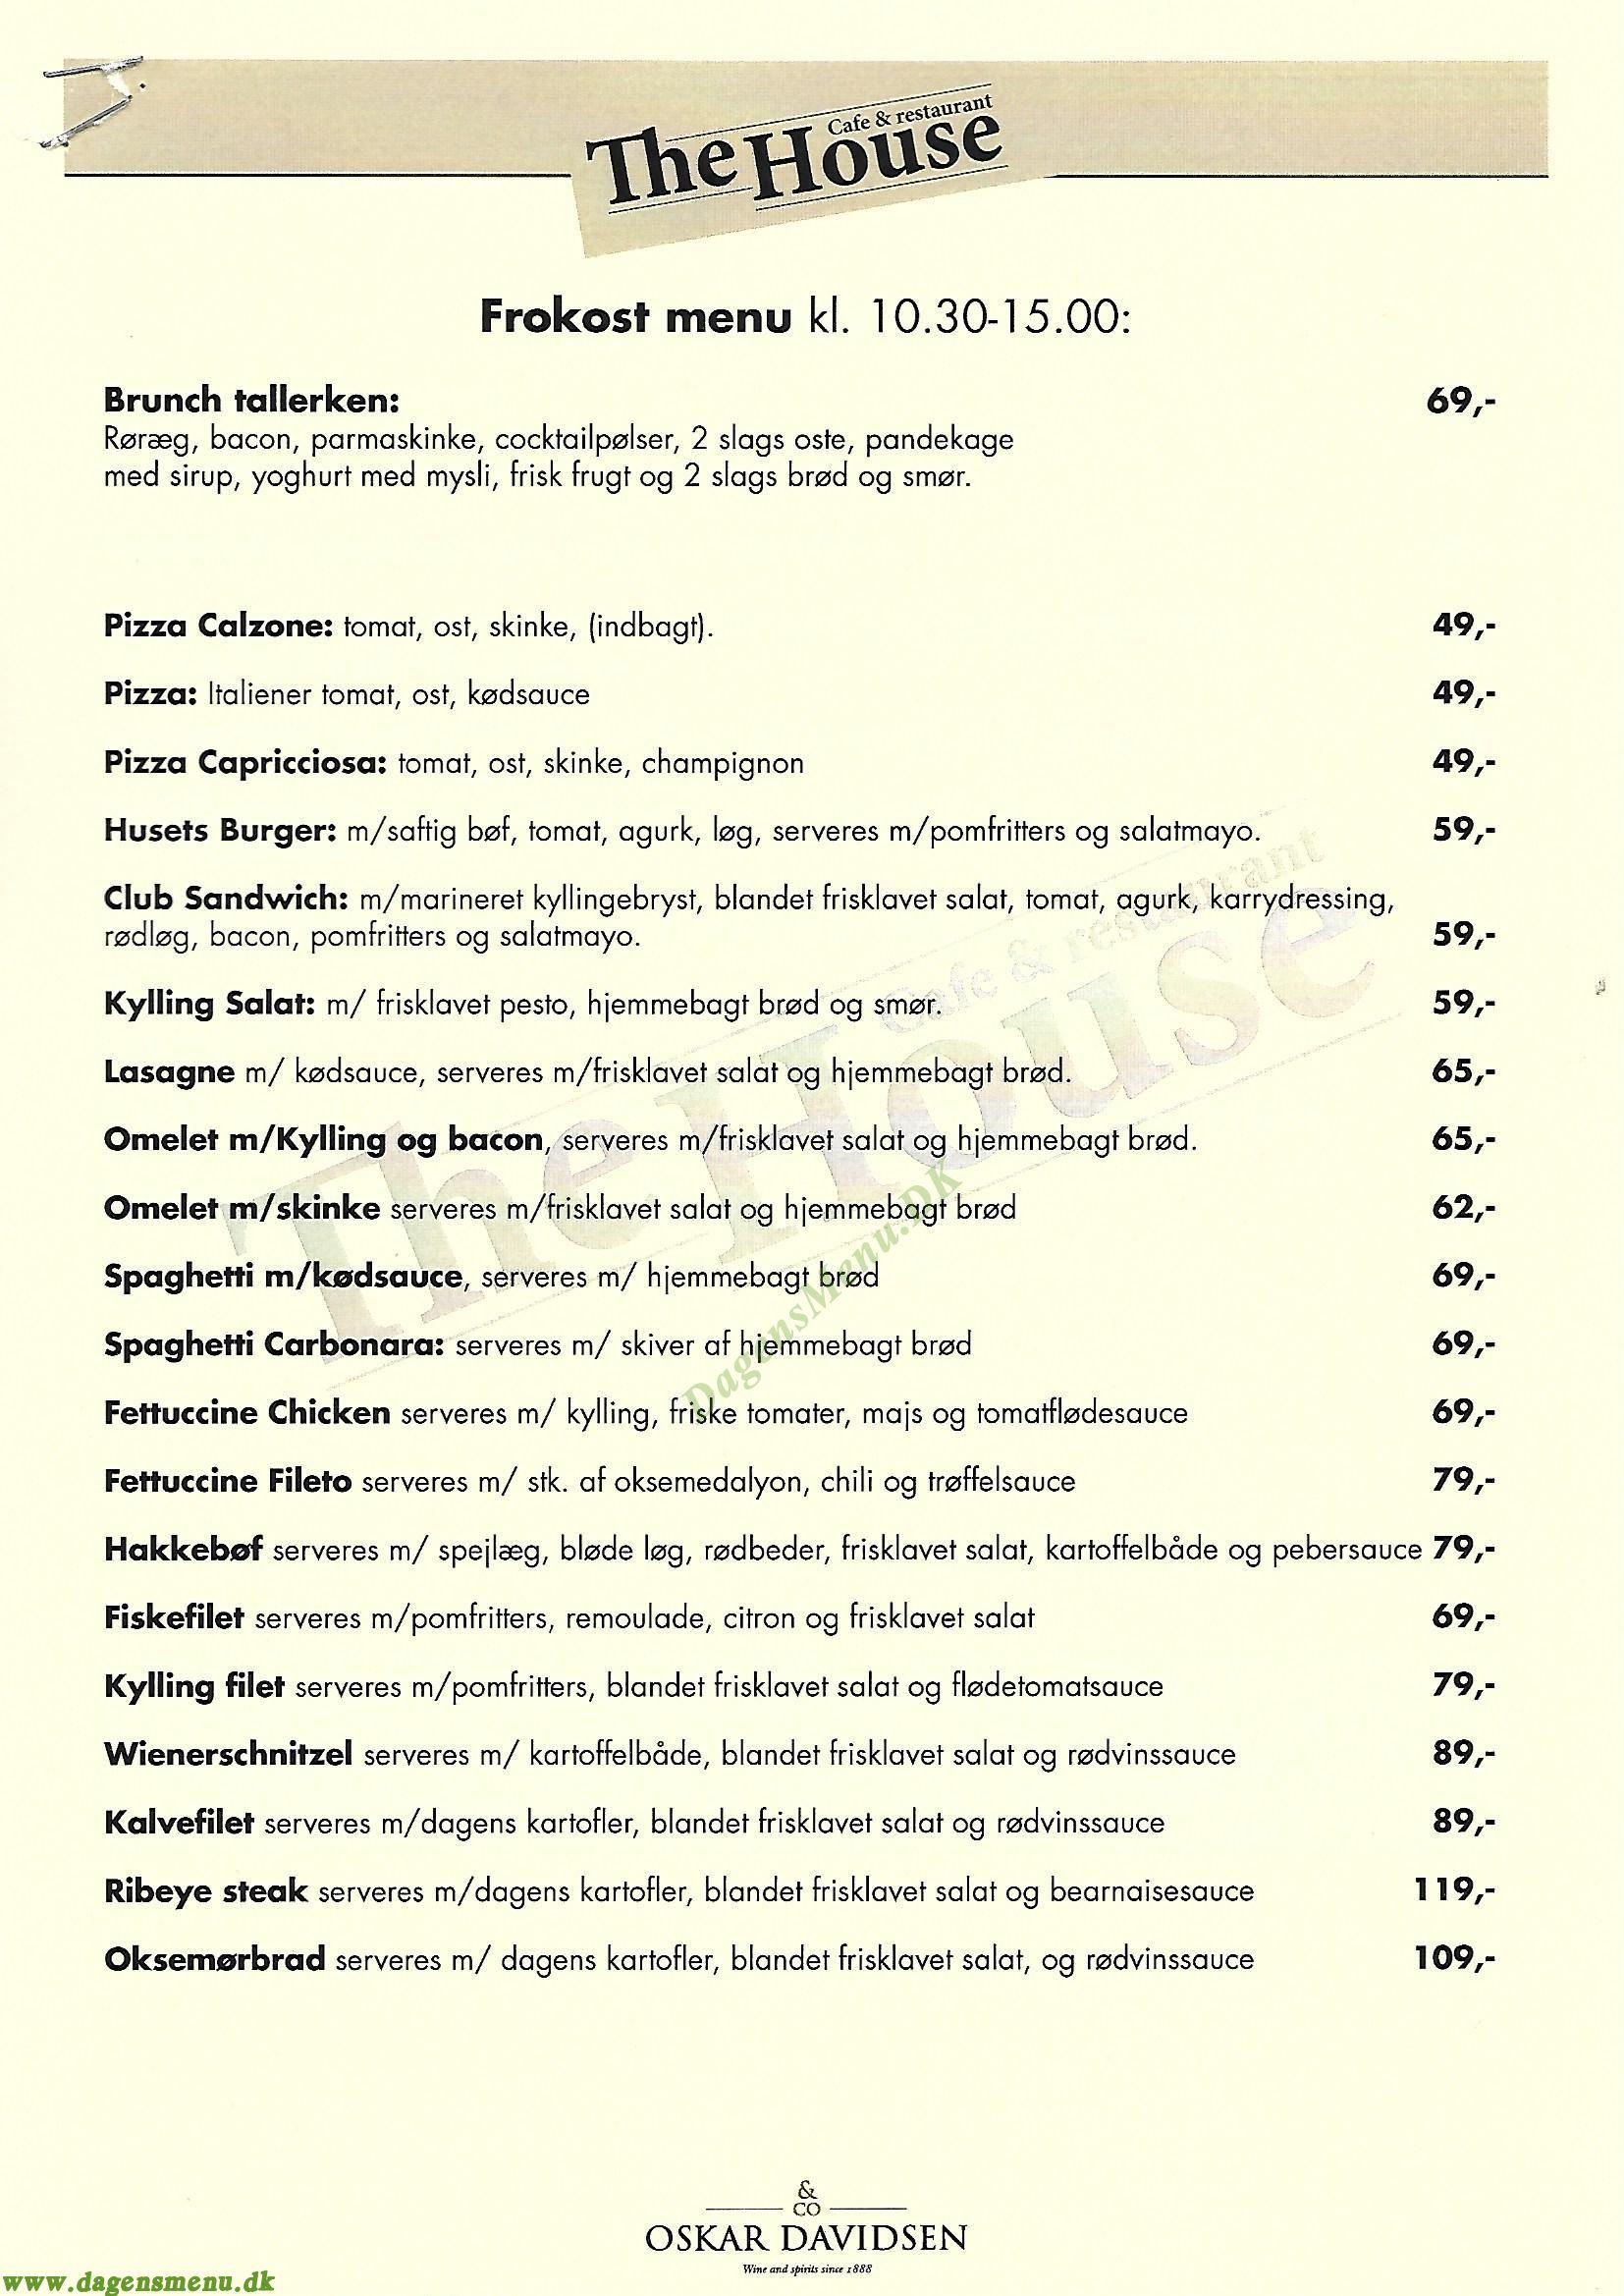 THE HOUSE CAFE & RESTAURANT - Menukort